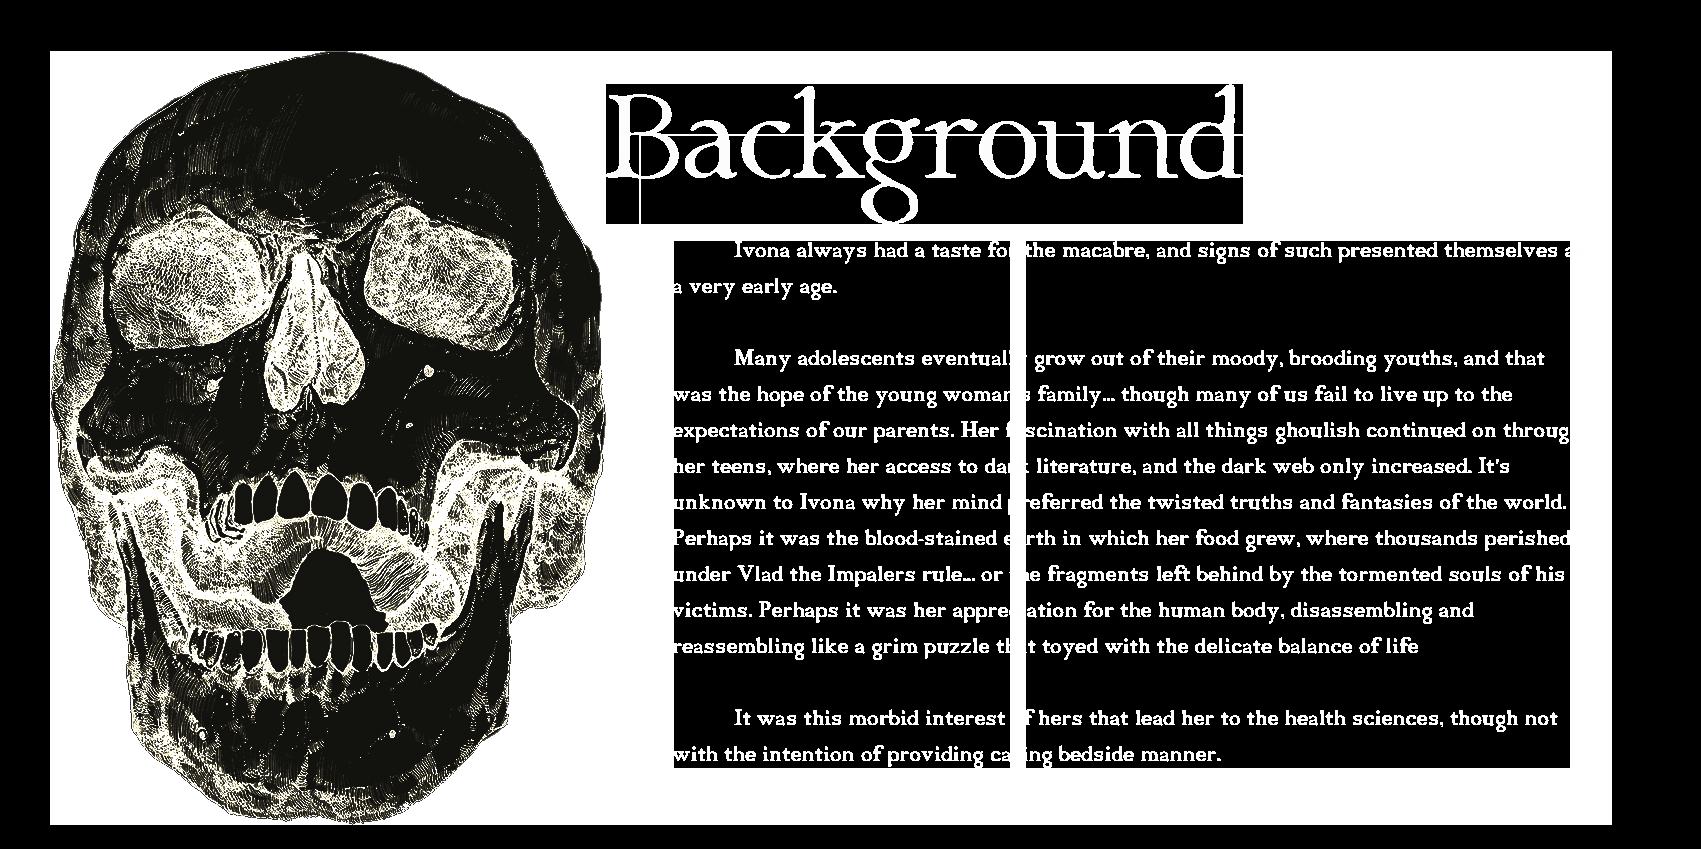 backgroundgraphicwparagraph.png.578976195f7b56da91b15e86d51da21c.png